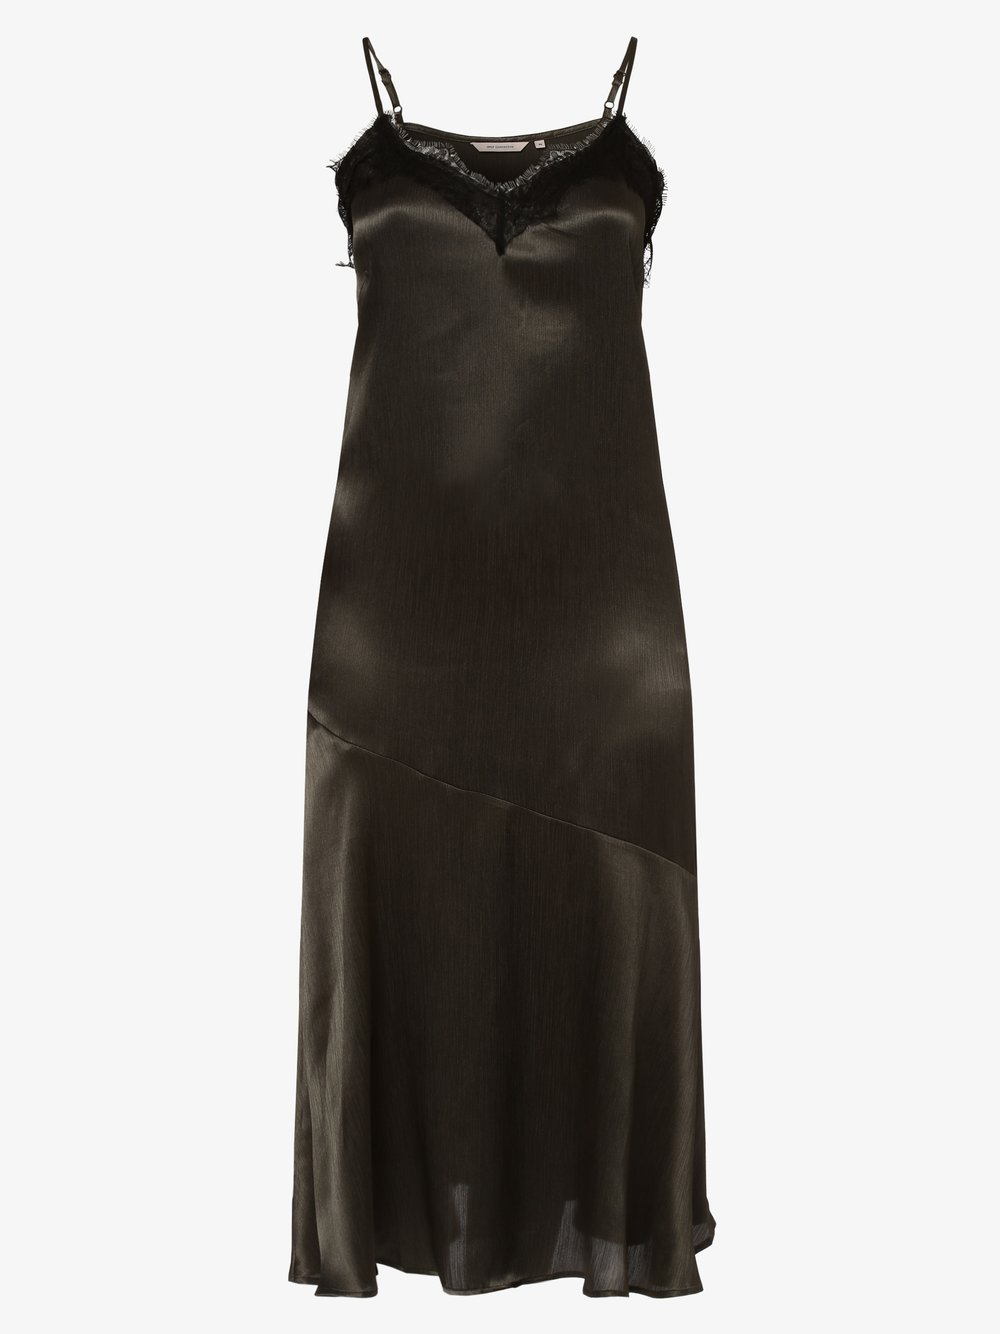 ONLY Carmakoma – Sukienka damska – Carmisty, zielony Van Graaf 473238-0001-00540